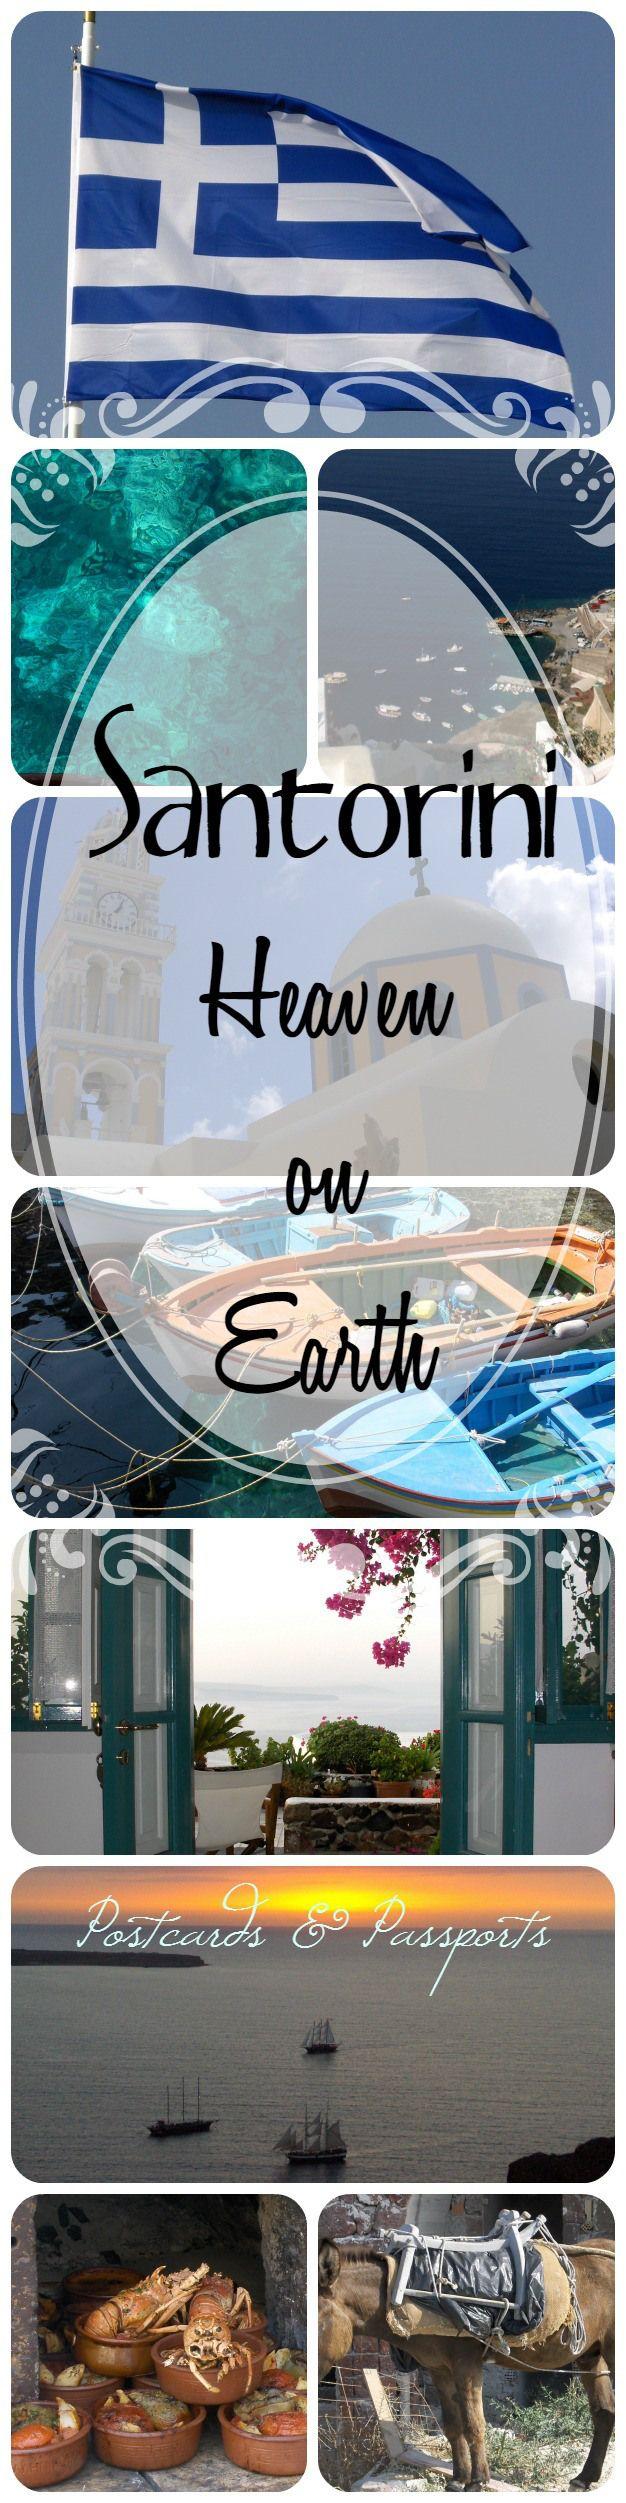 Santorini is the most beautiful and amazing place I have ever visited!  (Santorini, Greece) postcardsandpassports.com